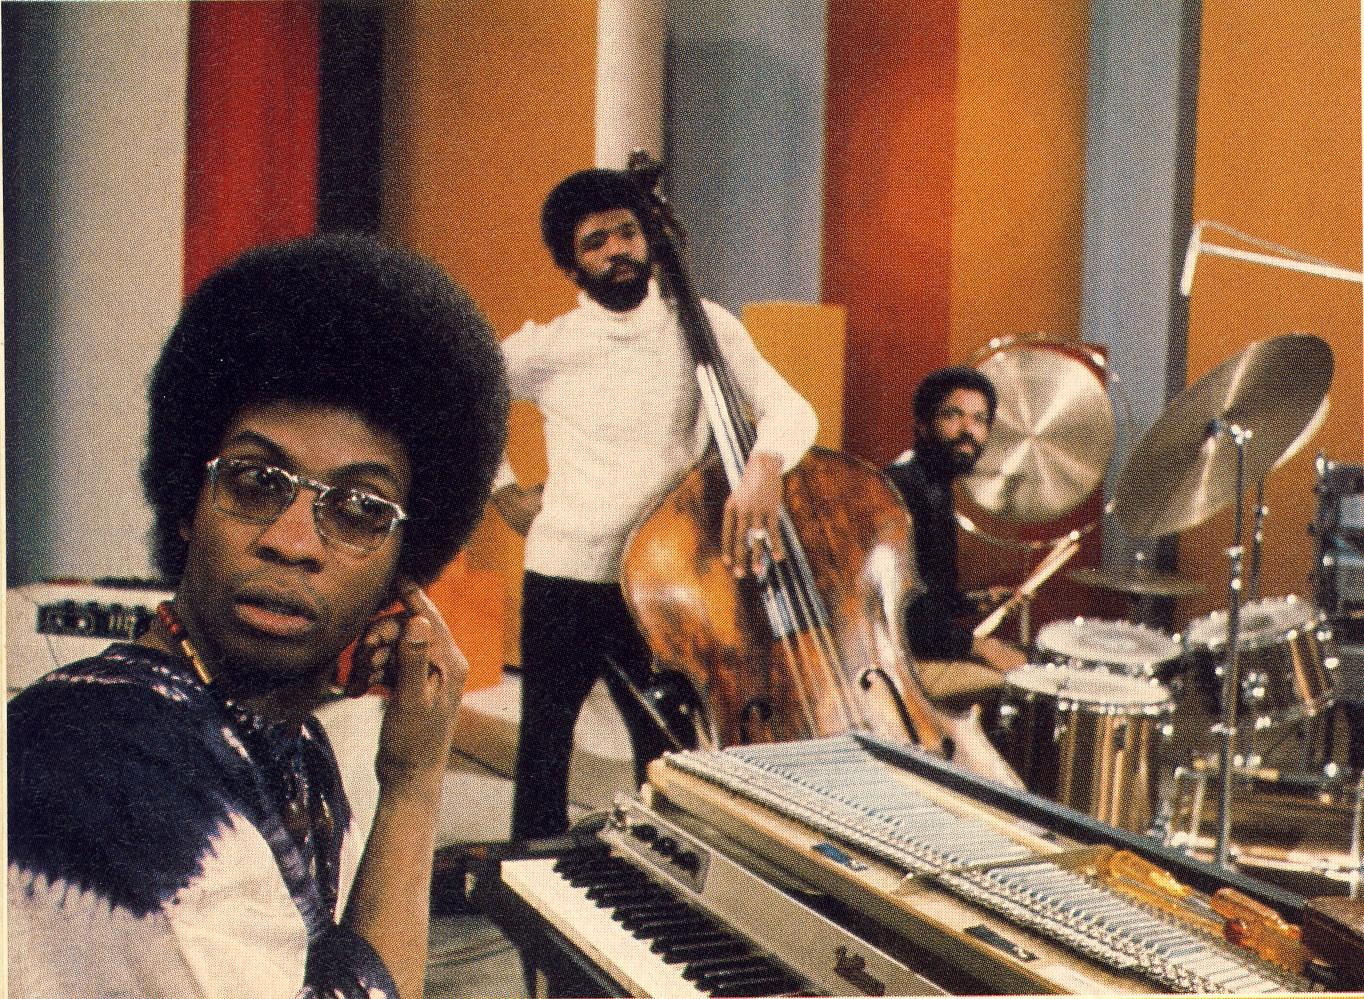 Herbie Hancock, el sonido Mwandishi y Kraftwerk